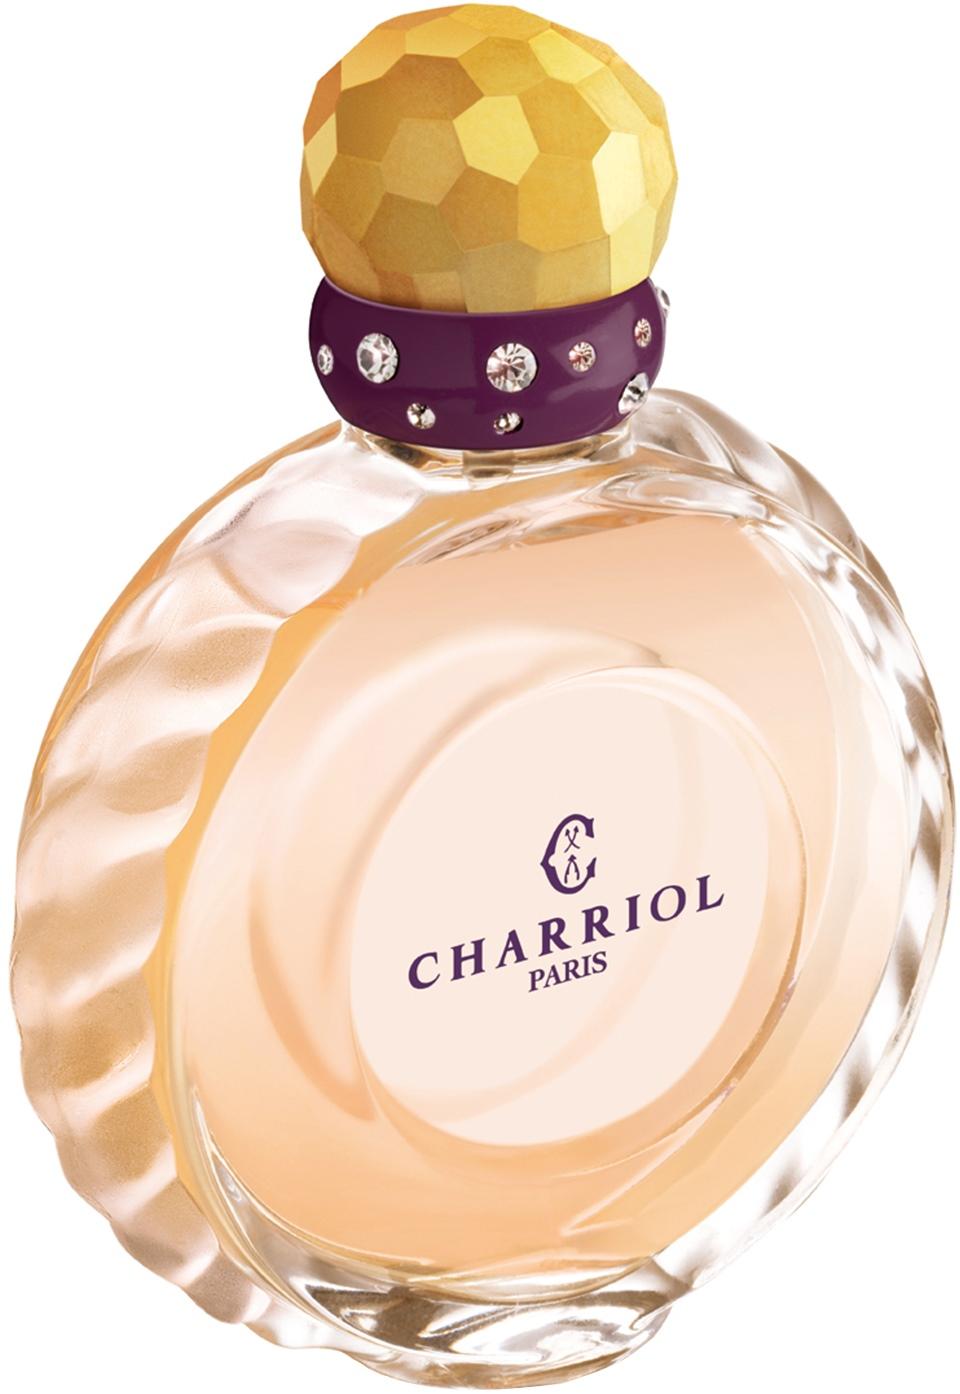 Charriol парфюмированная вода 100мл тестер (Шариоль)